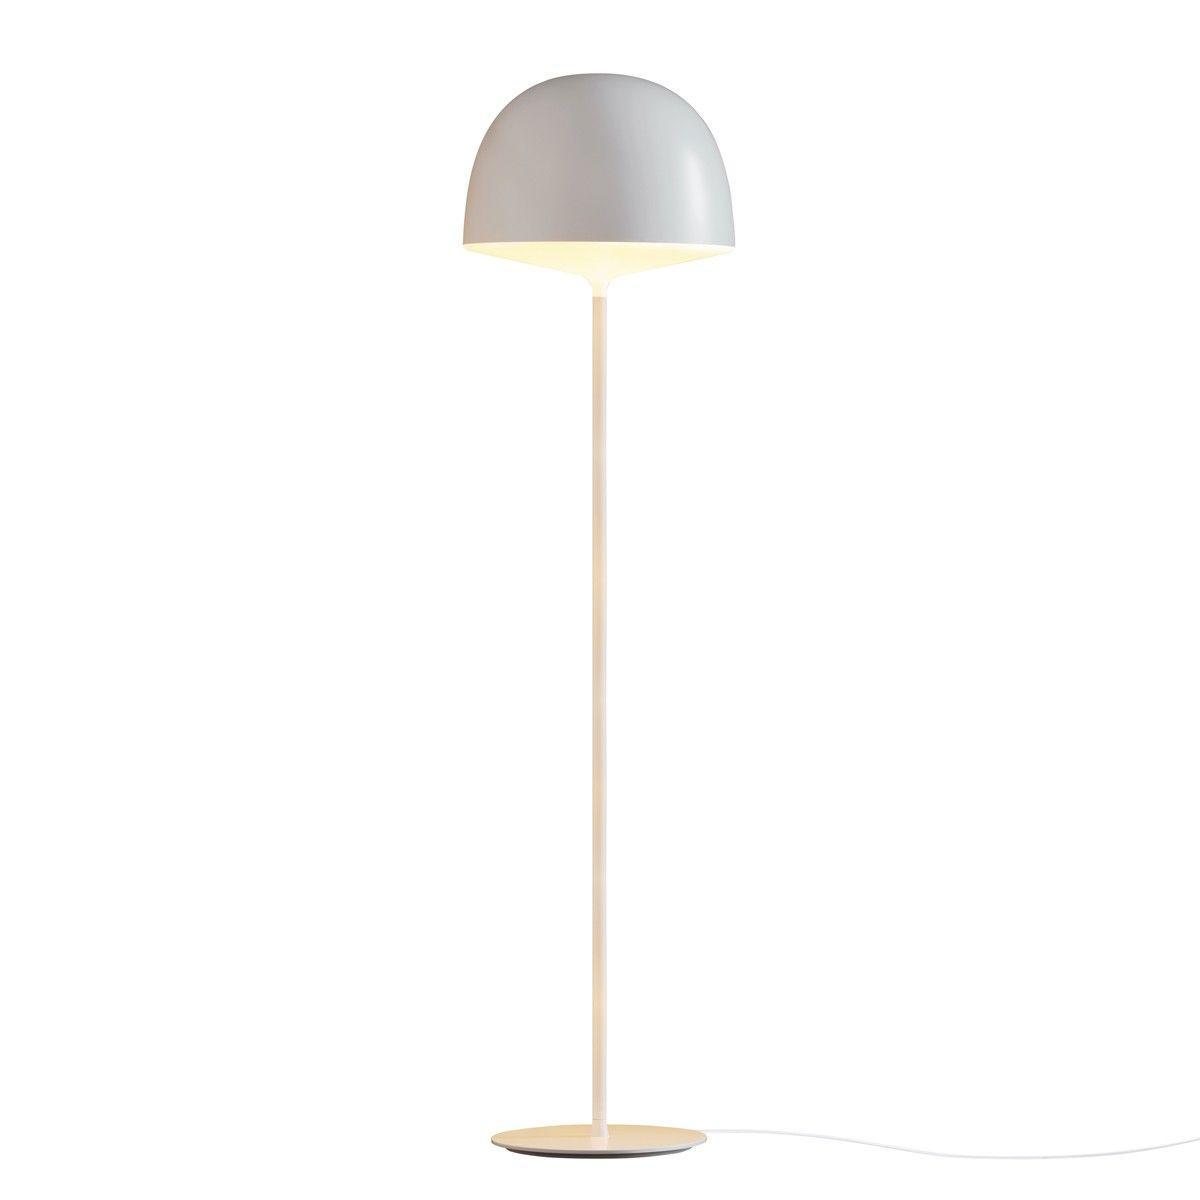 Stehlampe Papier 180 Cm